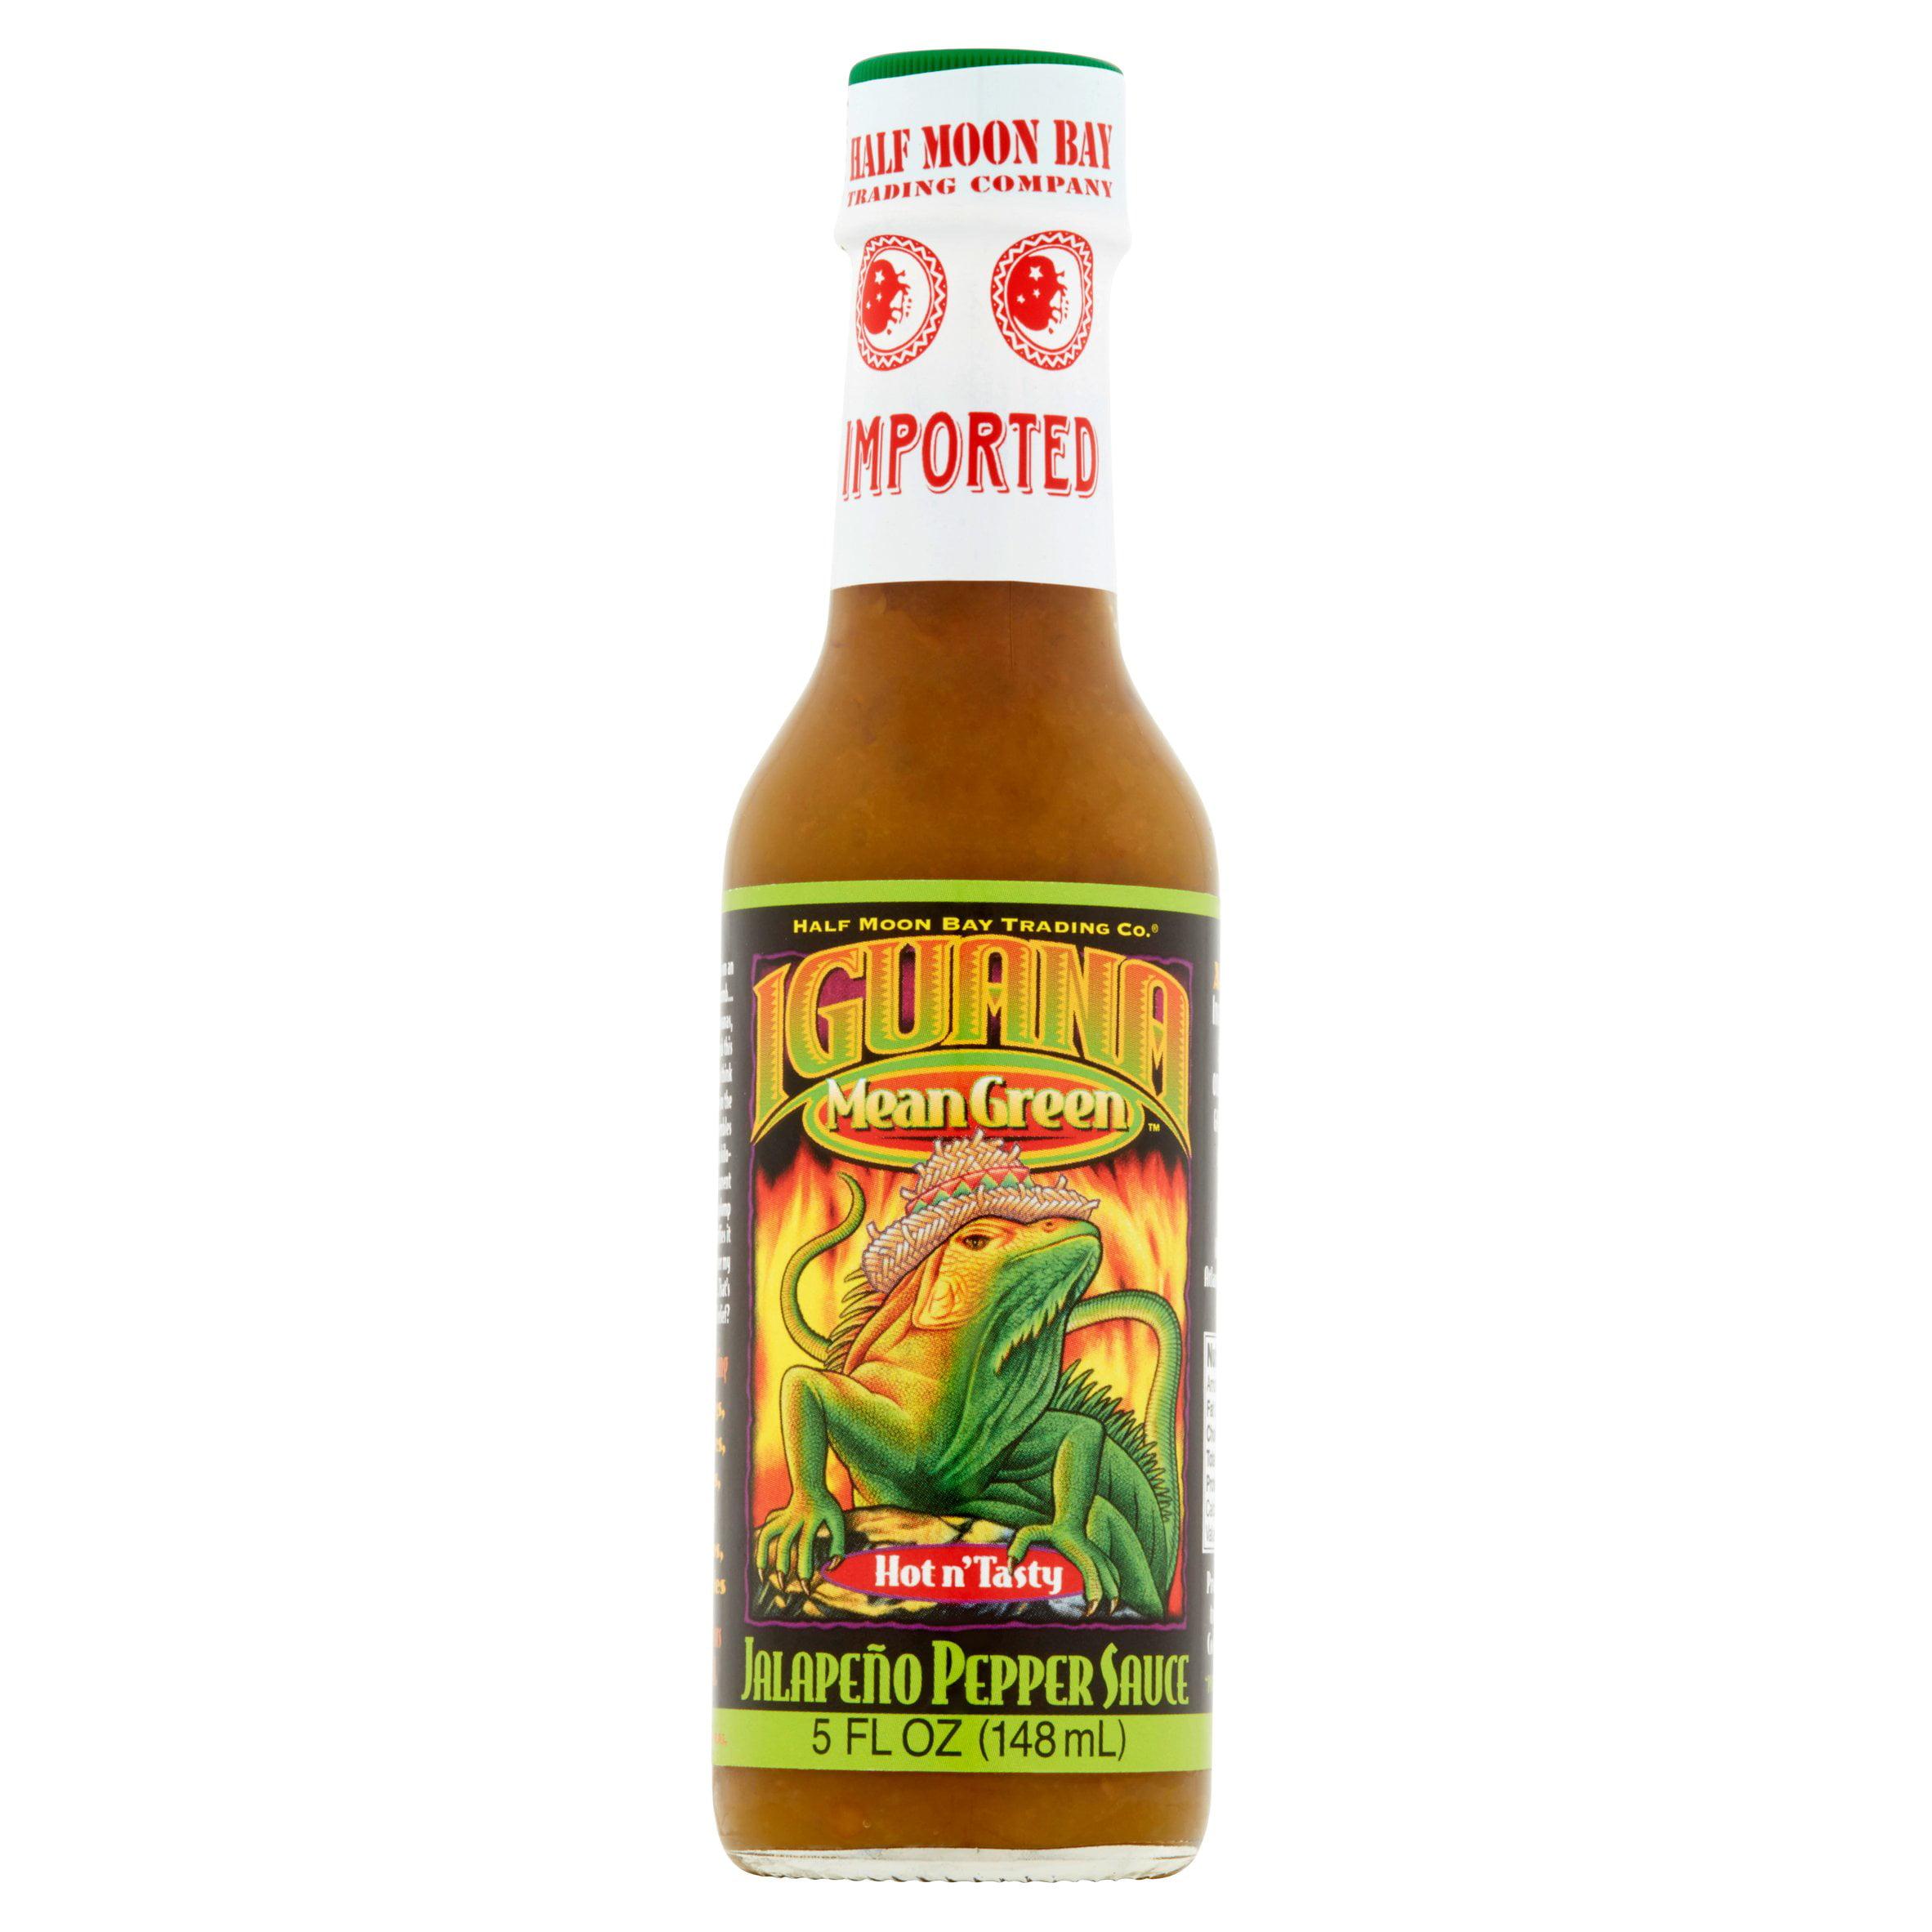 Iguana Mean Green Hot n' Tasty Jalapeño Pepper Sauce, 5 fl oz, 6 pack by Half Moon Bay Trading Company